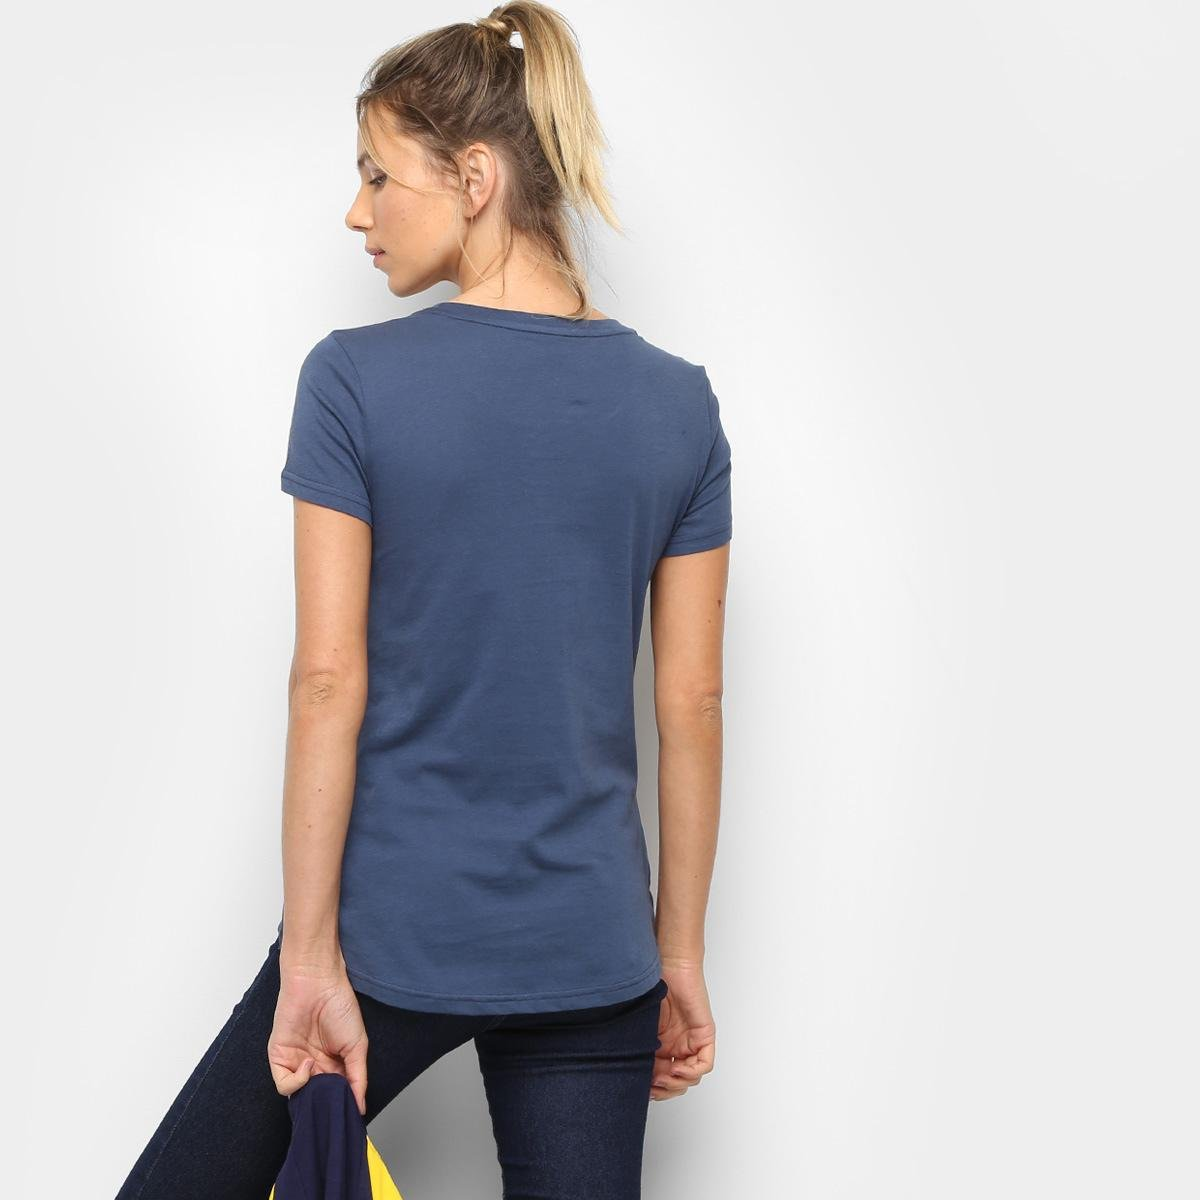 Feminina Camiseta Puma Athletic Camiseta Tee Puma Azul Camiseta Feminina Azul Puma Athletic Tee rRw8zrY